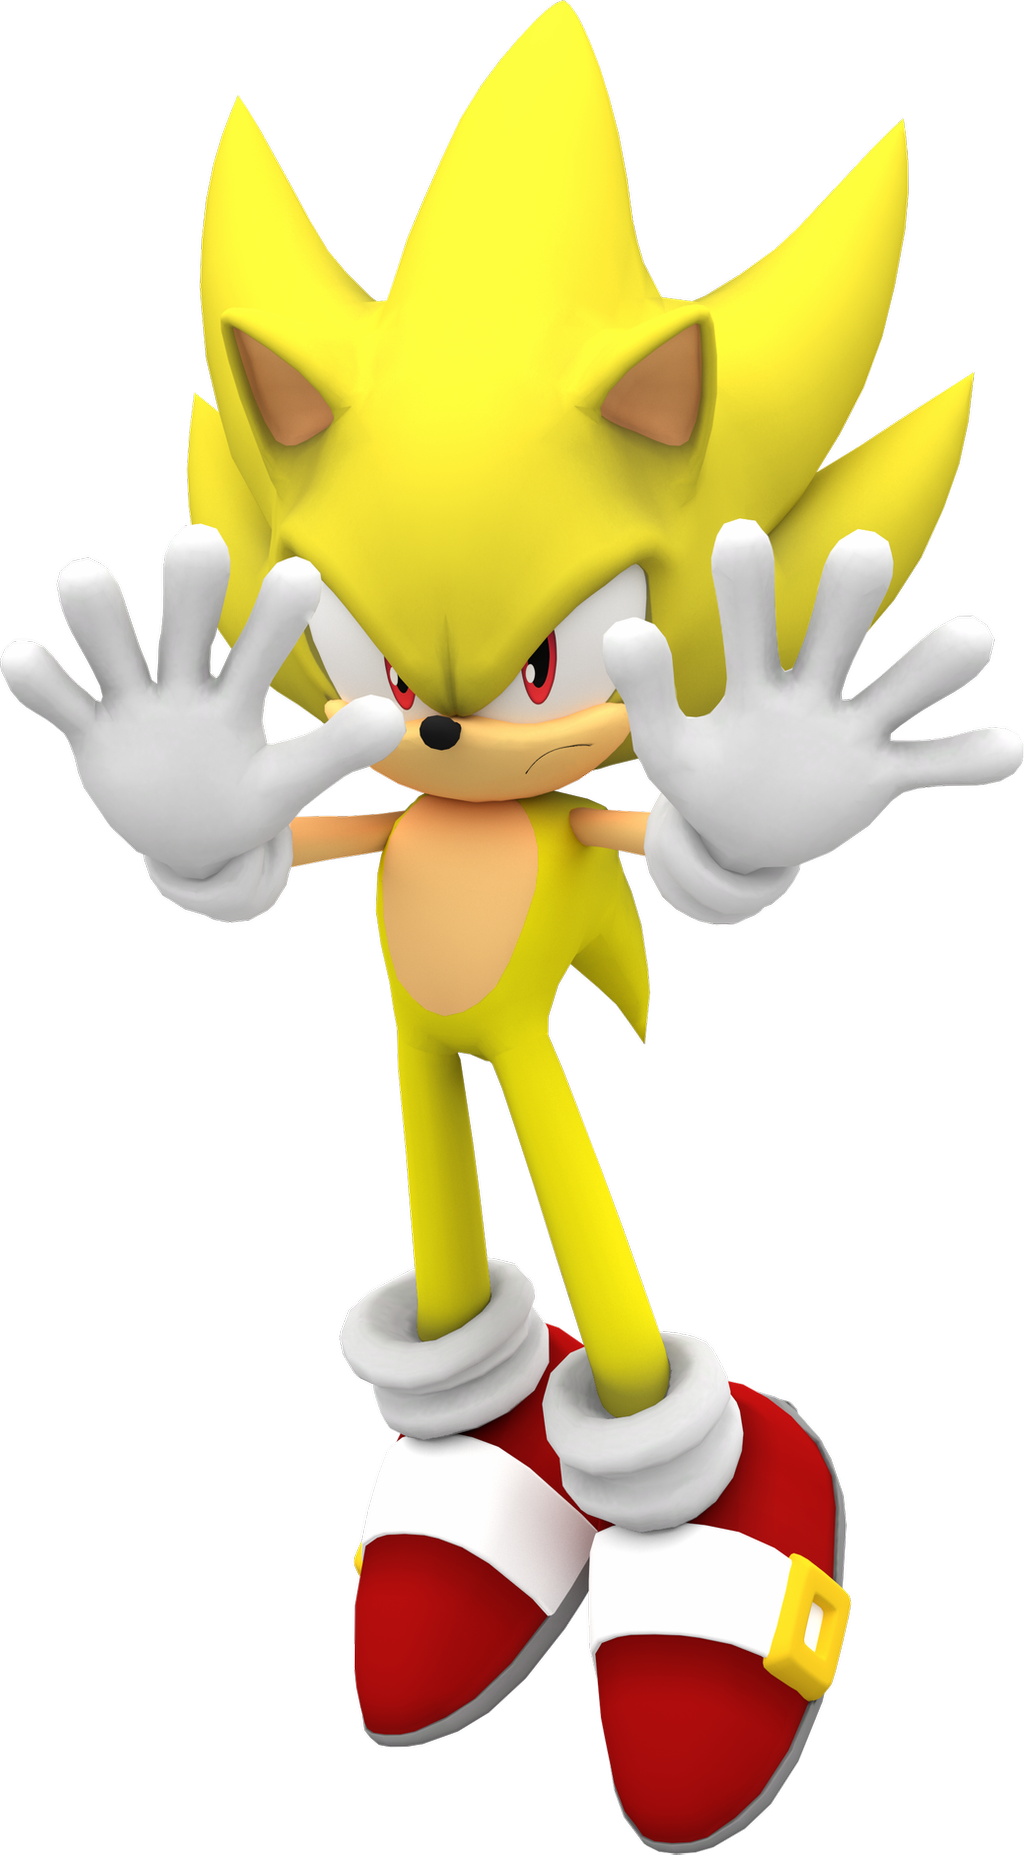 Super Sonic By Pho3nixsfm On Deviantart Sonic Party Sonic Birthday Sonic